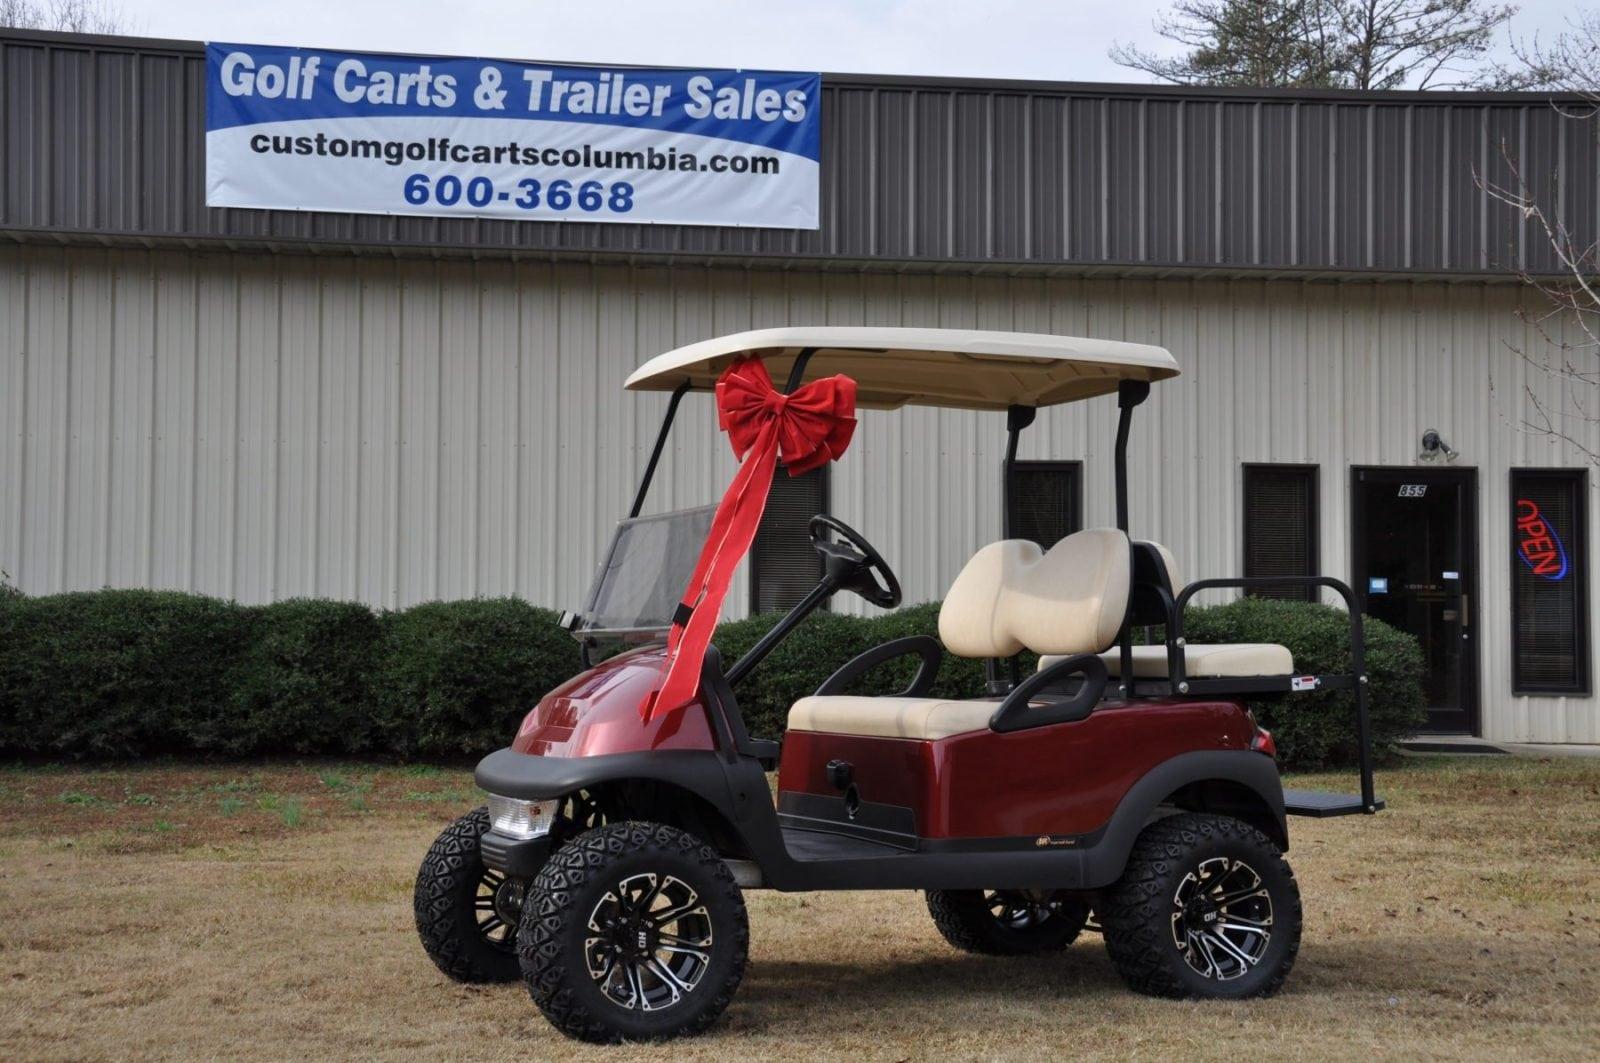 Mount Pleasant Golf Carts